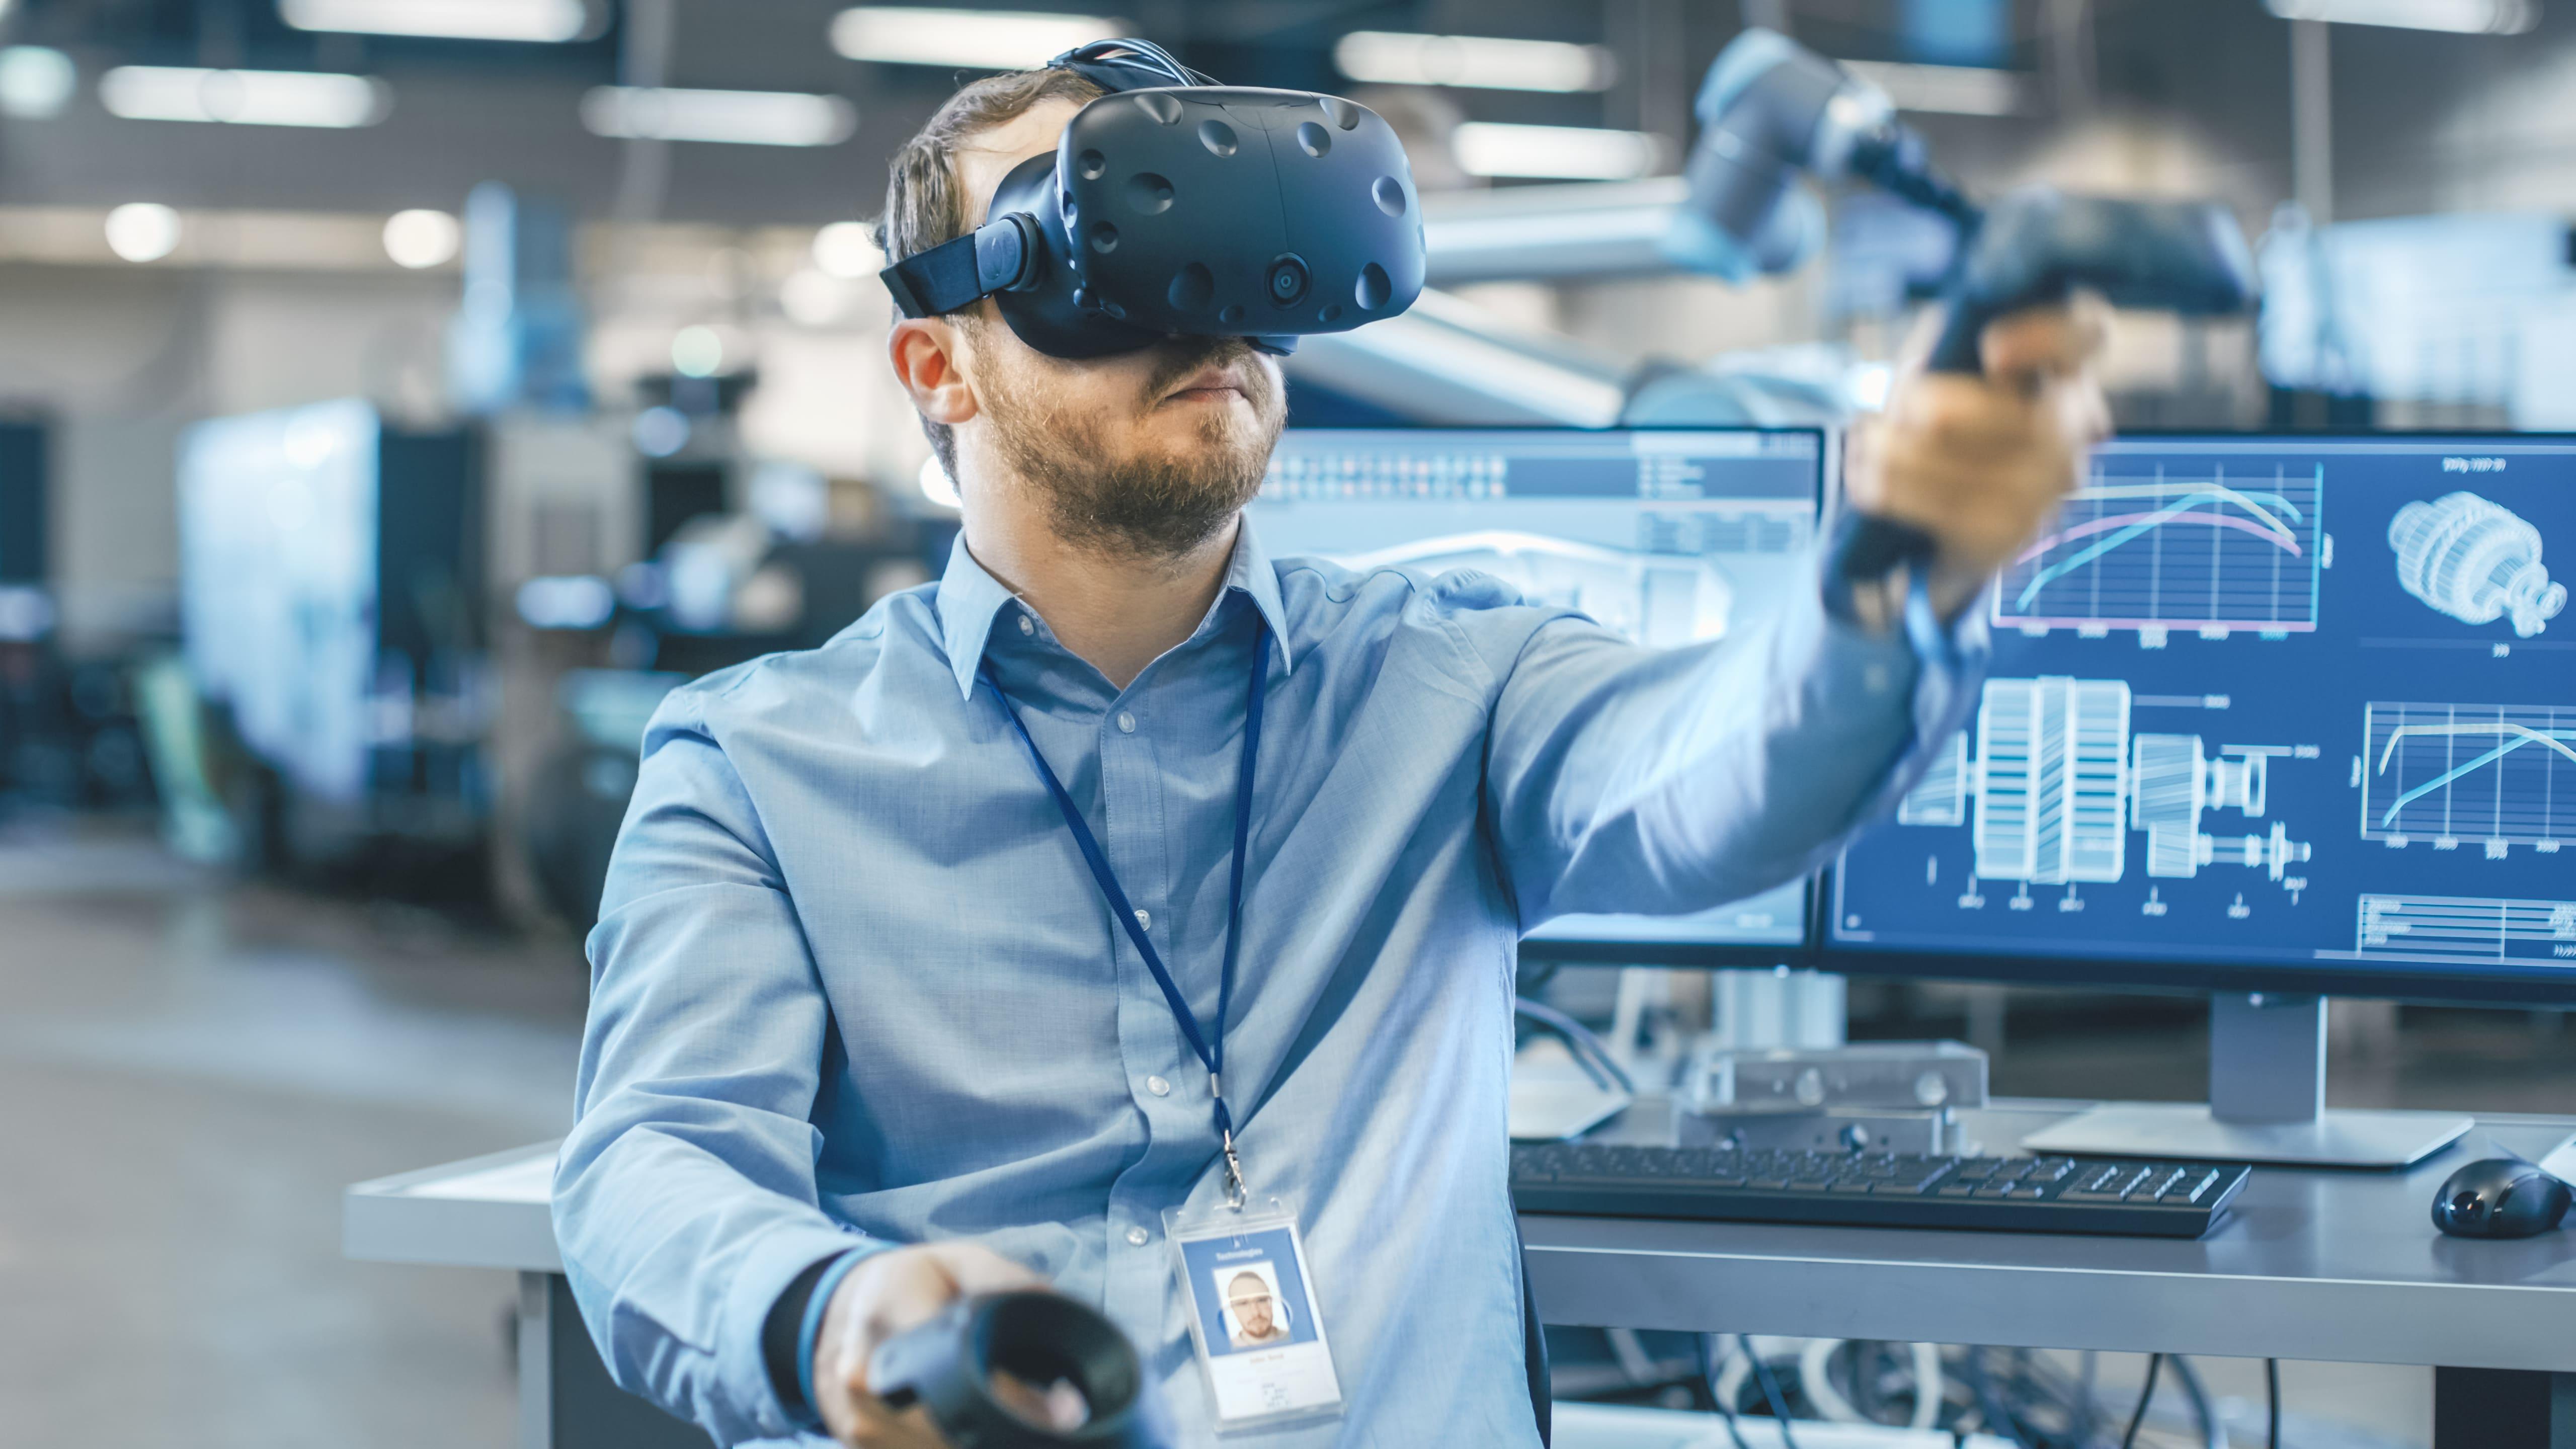 vection virtual prototyping vr technologies advantages